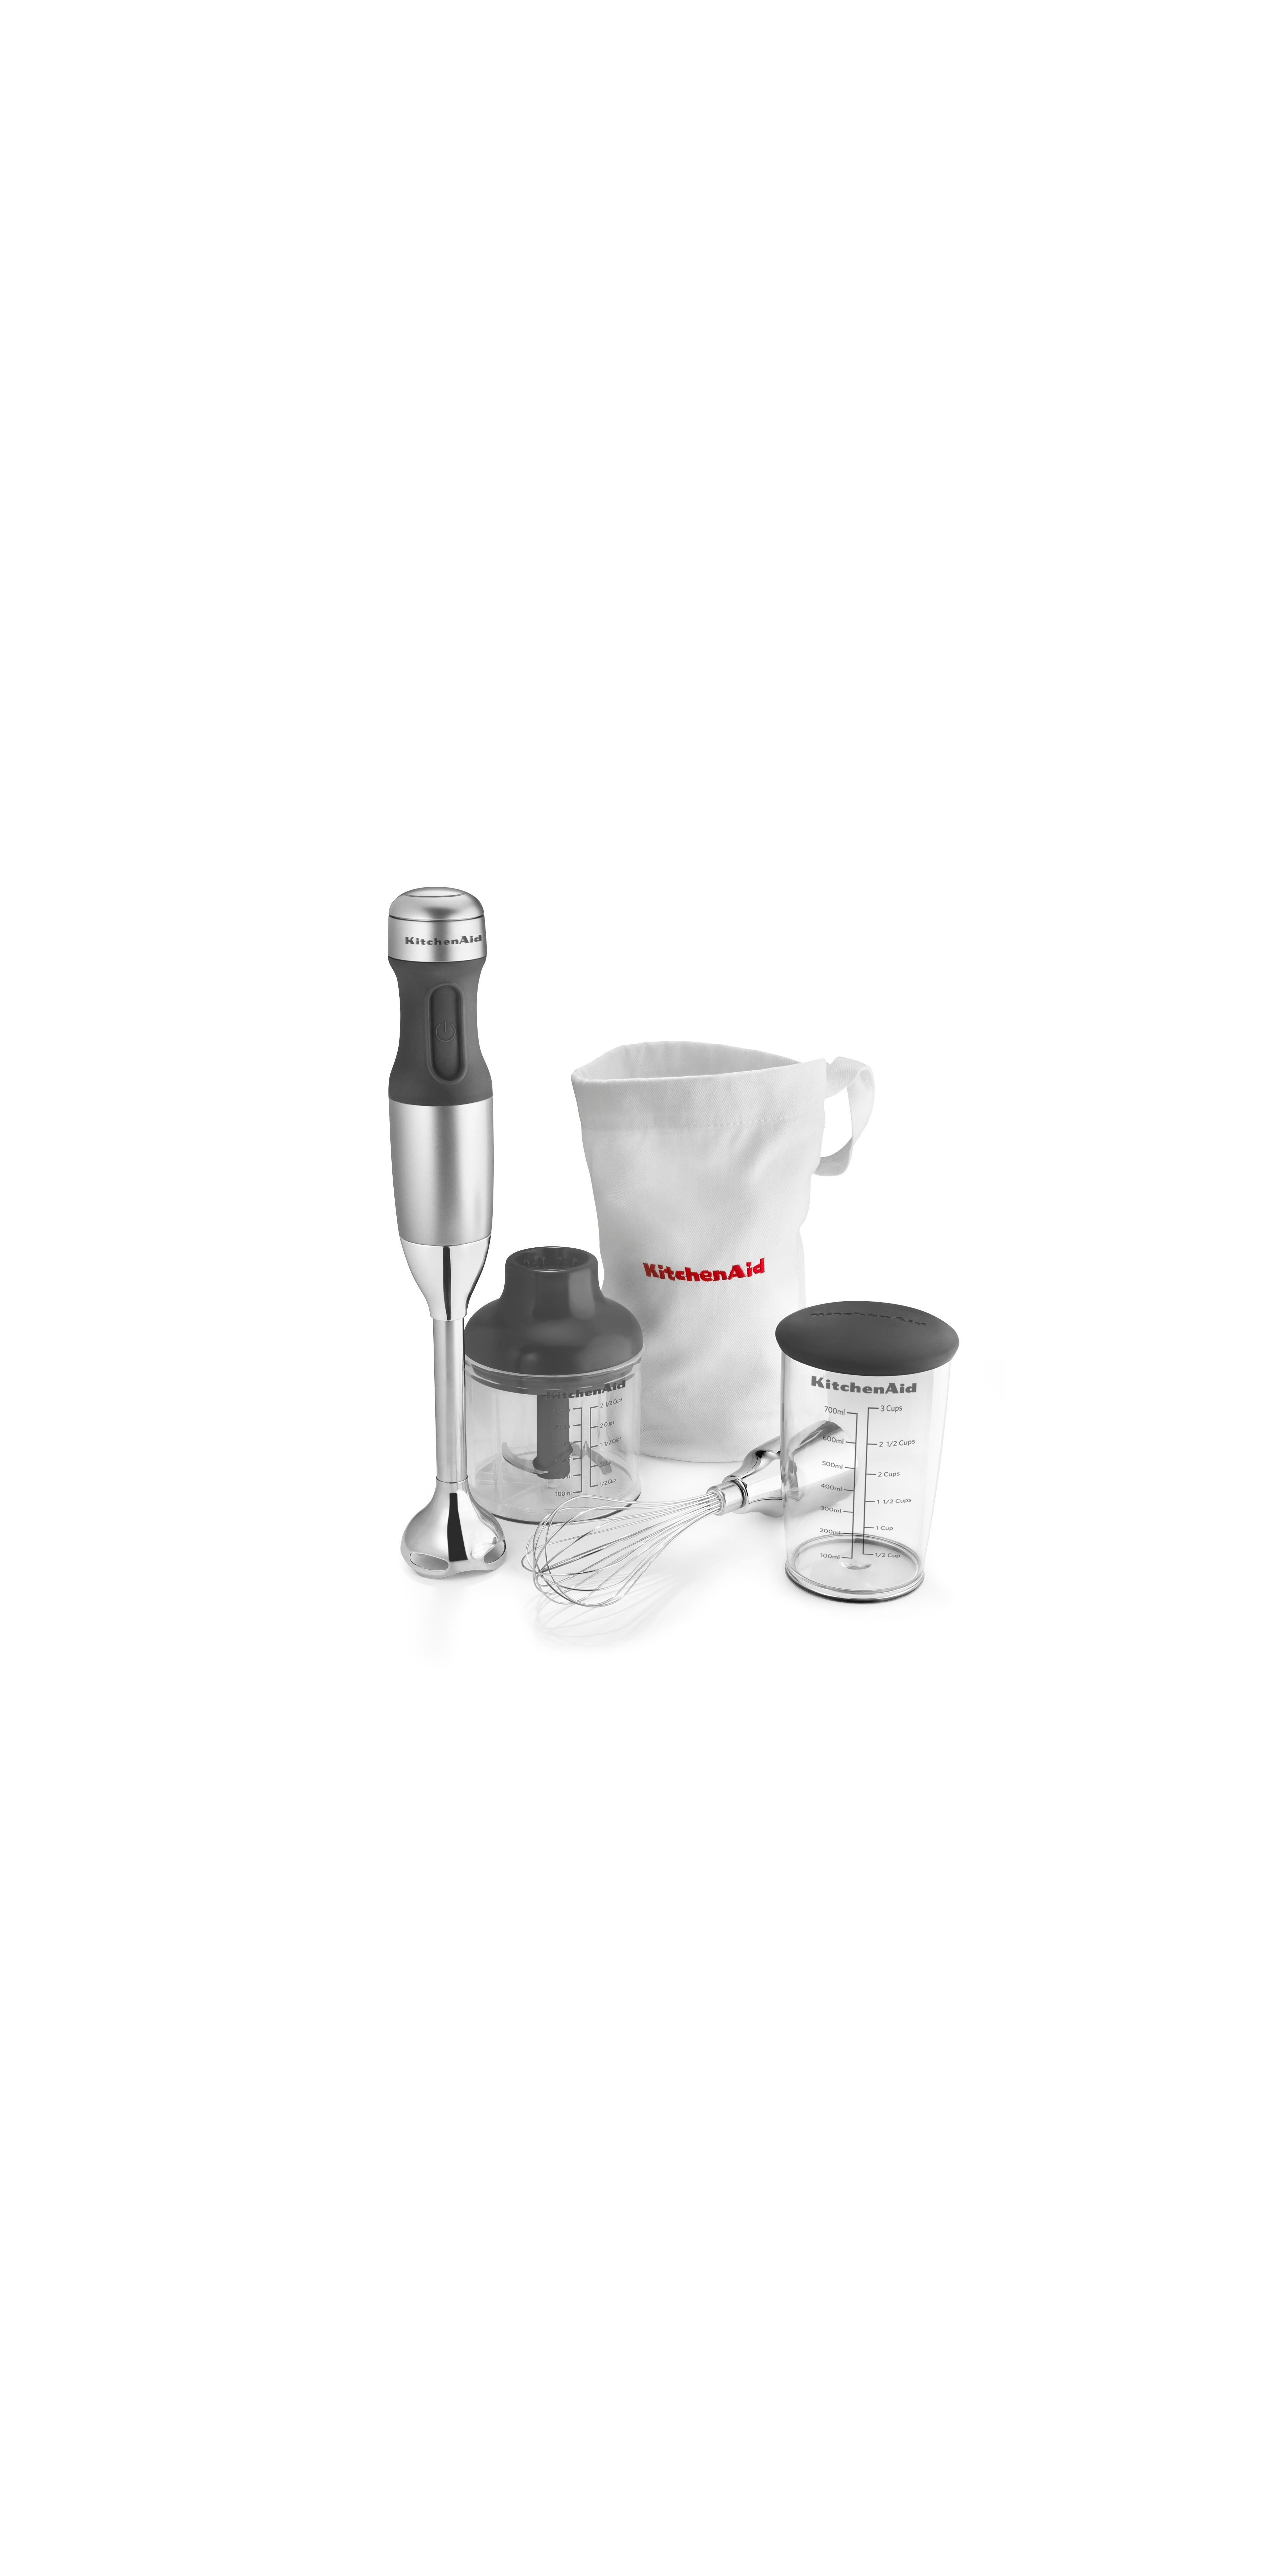 kitchenaid 3 speed blender white